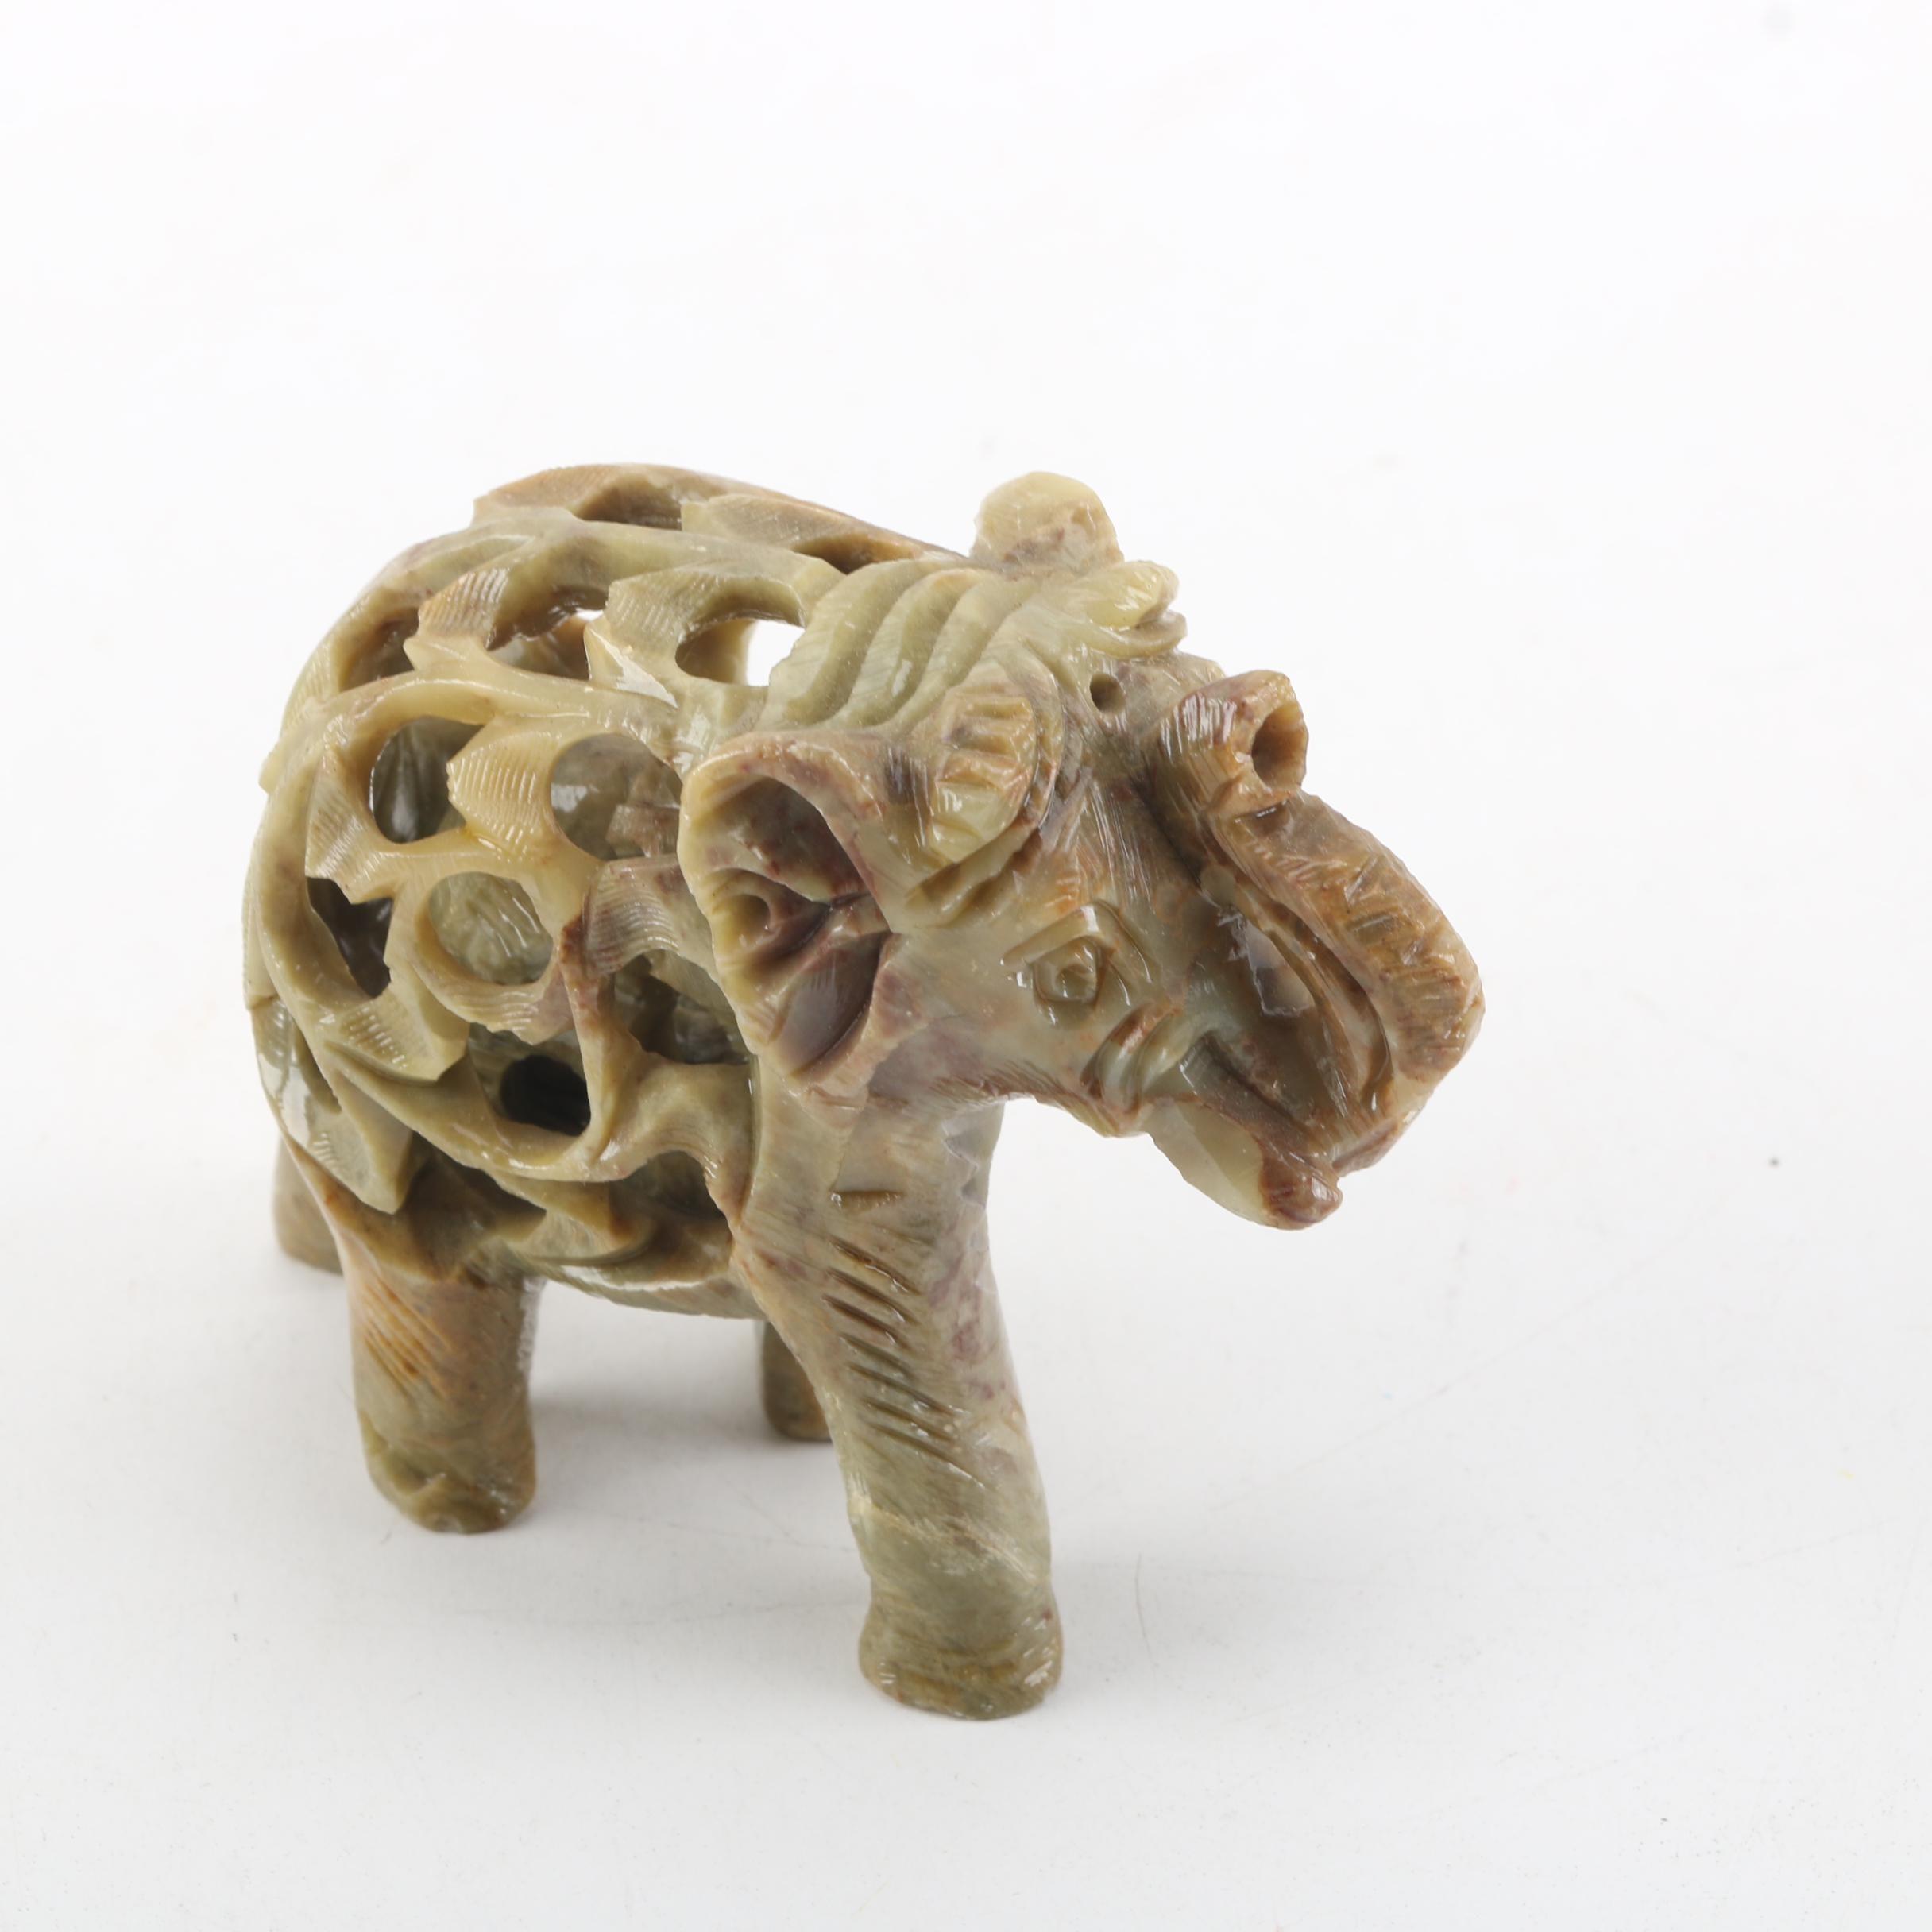 Carved Soapstone Elephant Figurine